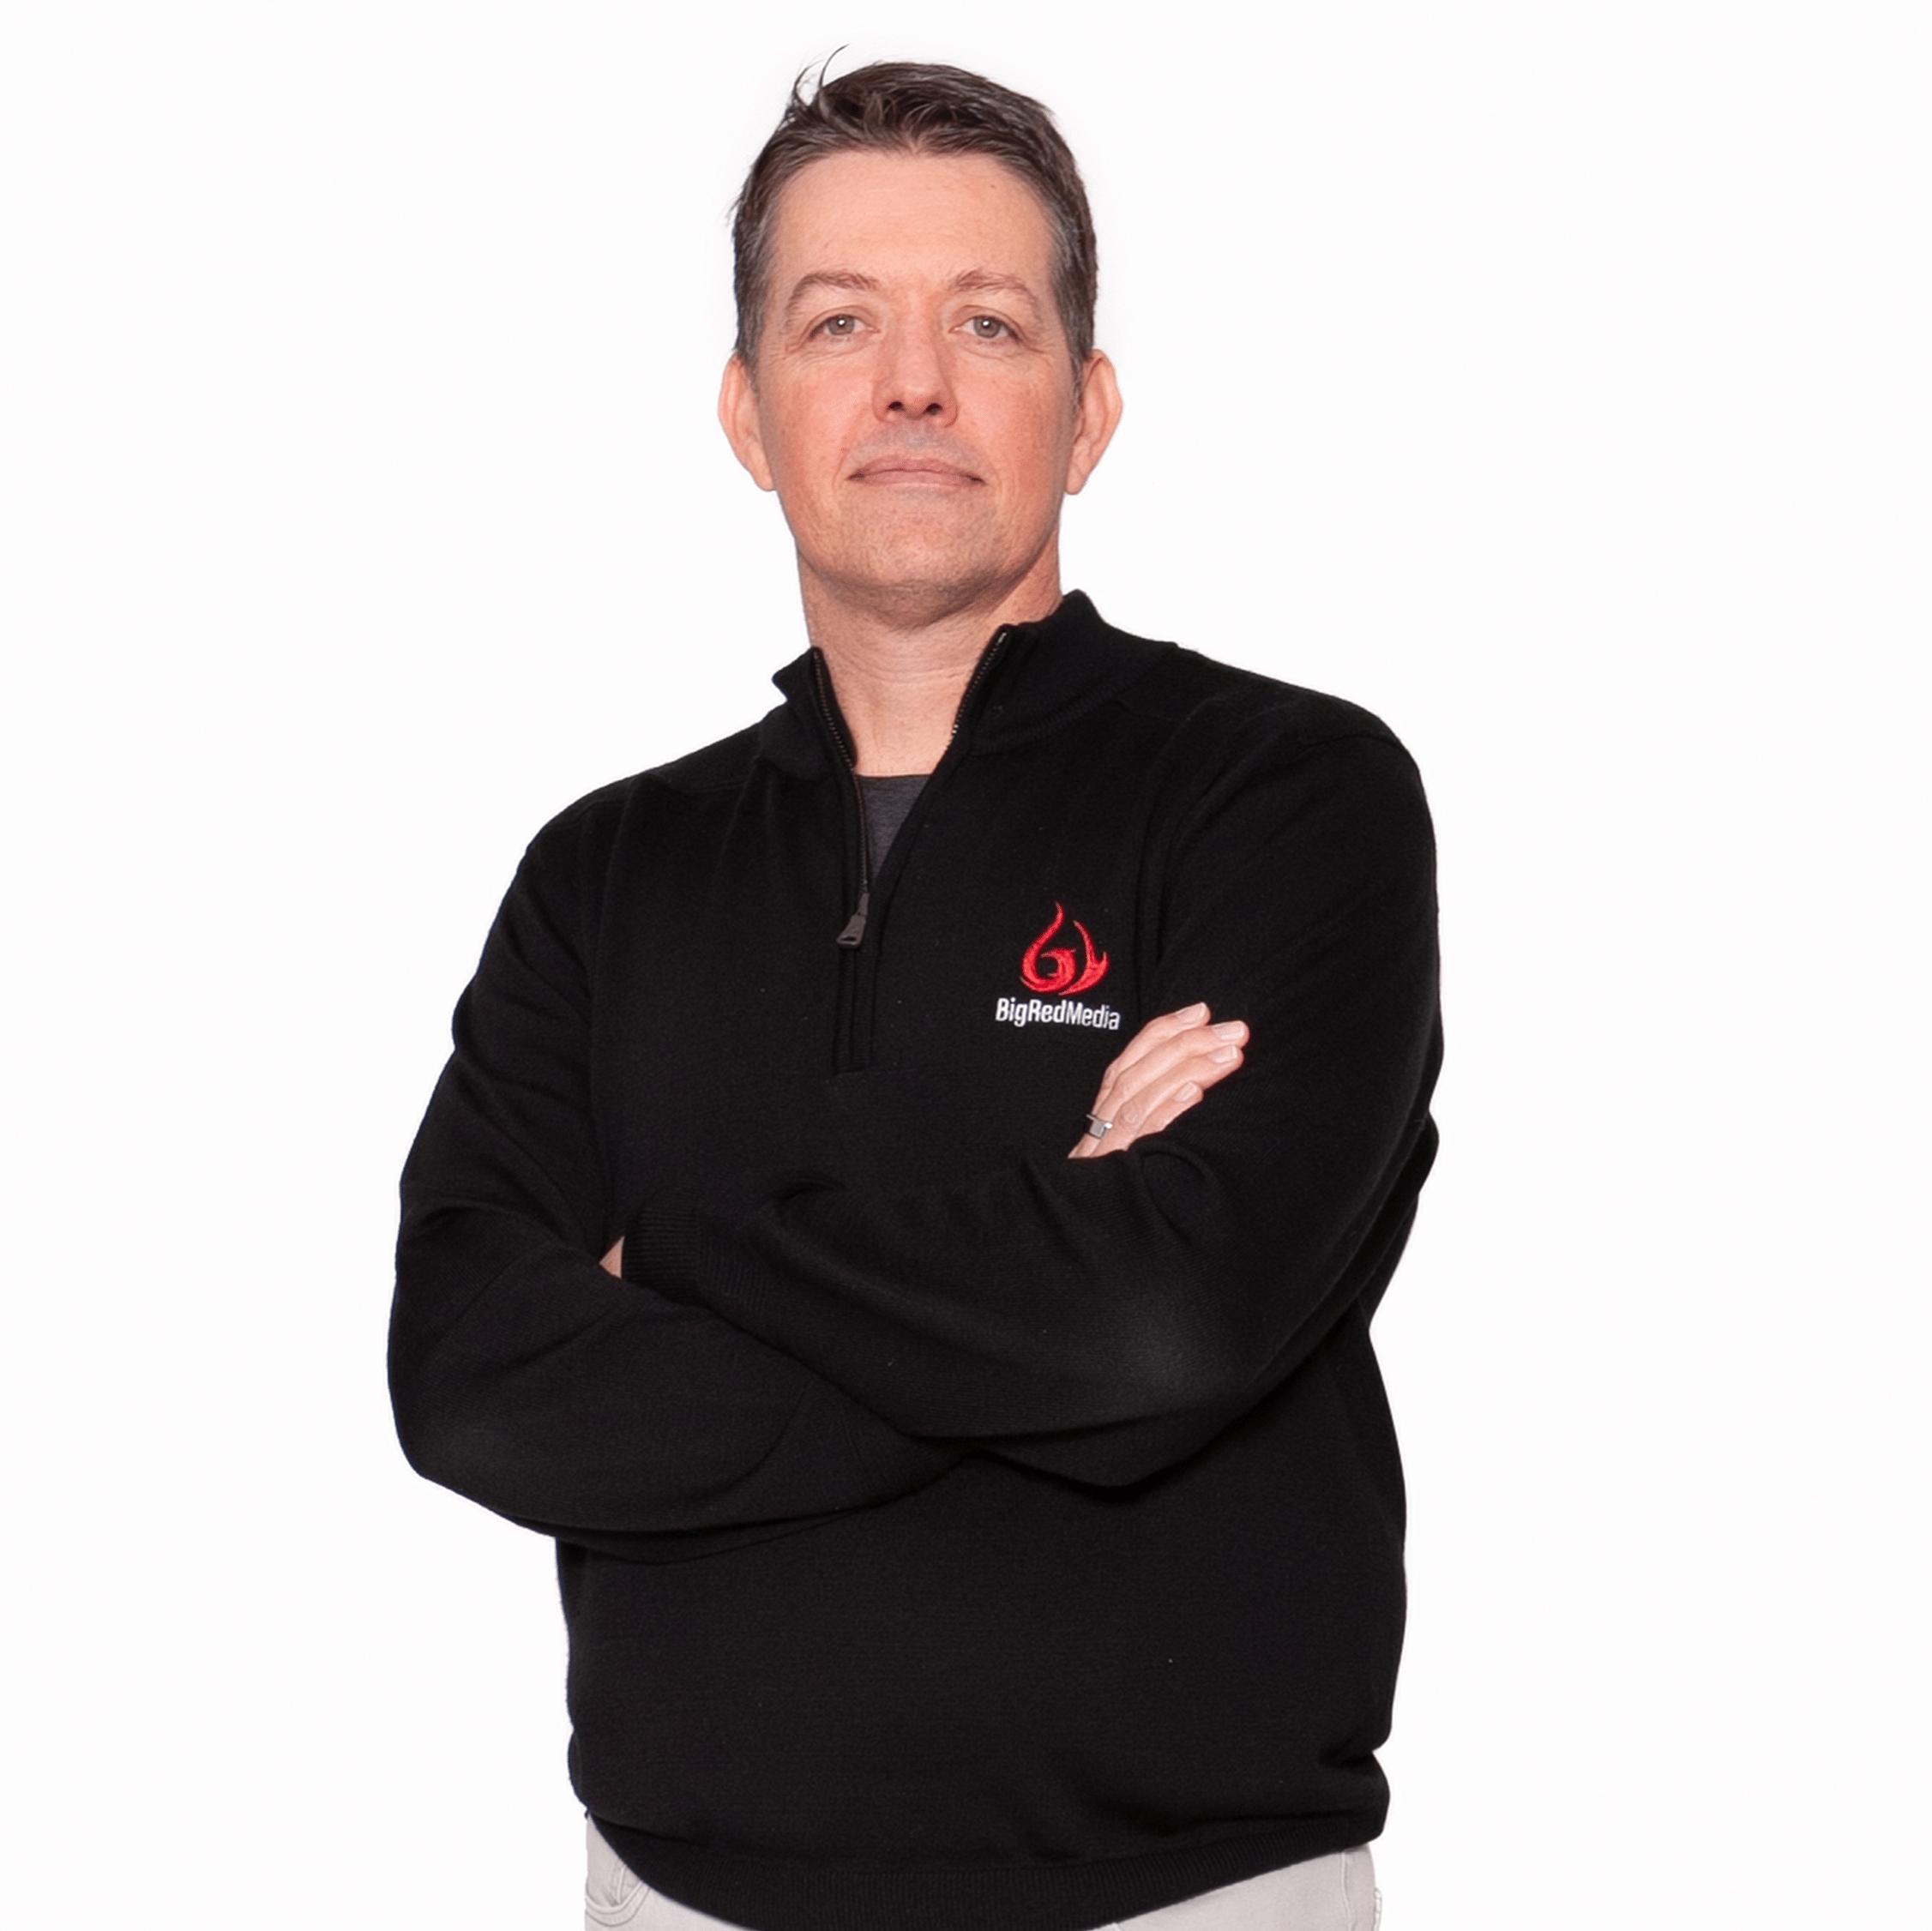 Jeff Johnson | VP Big Red Media